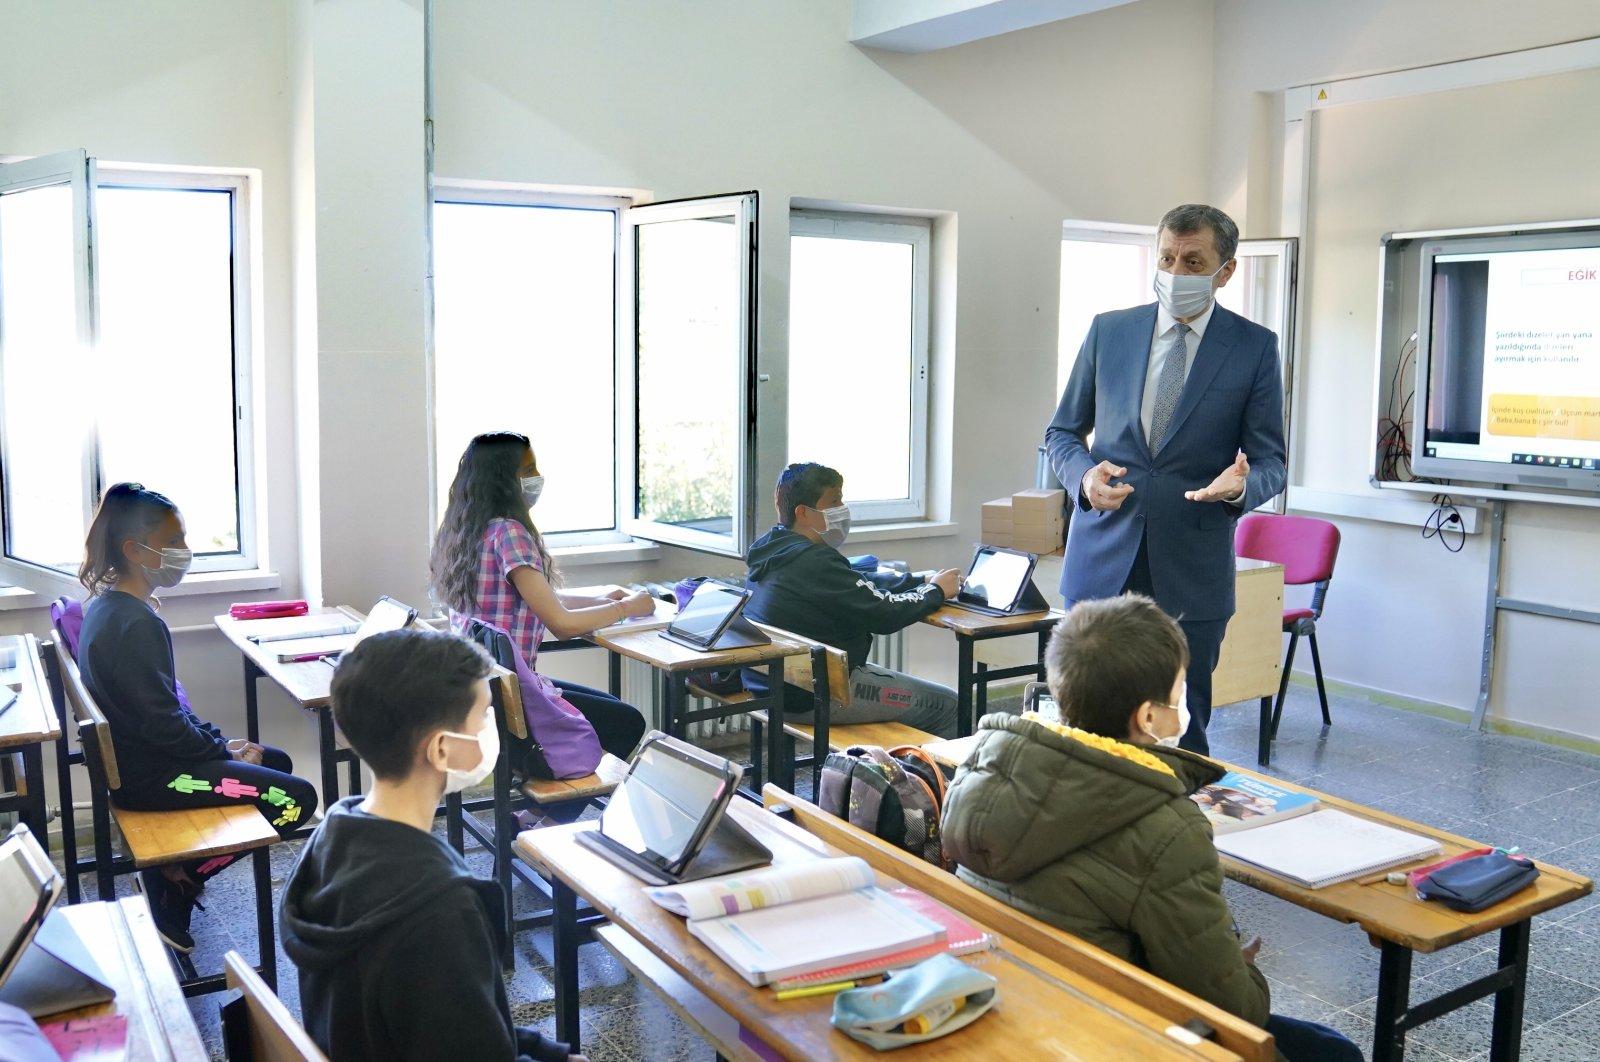 Minister of National Education Ziya Selçuk speaks to children at a school in Giresun, northern Turkey, Oct. 23, 2020. (AA Photo)